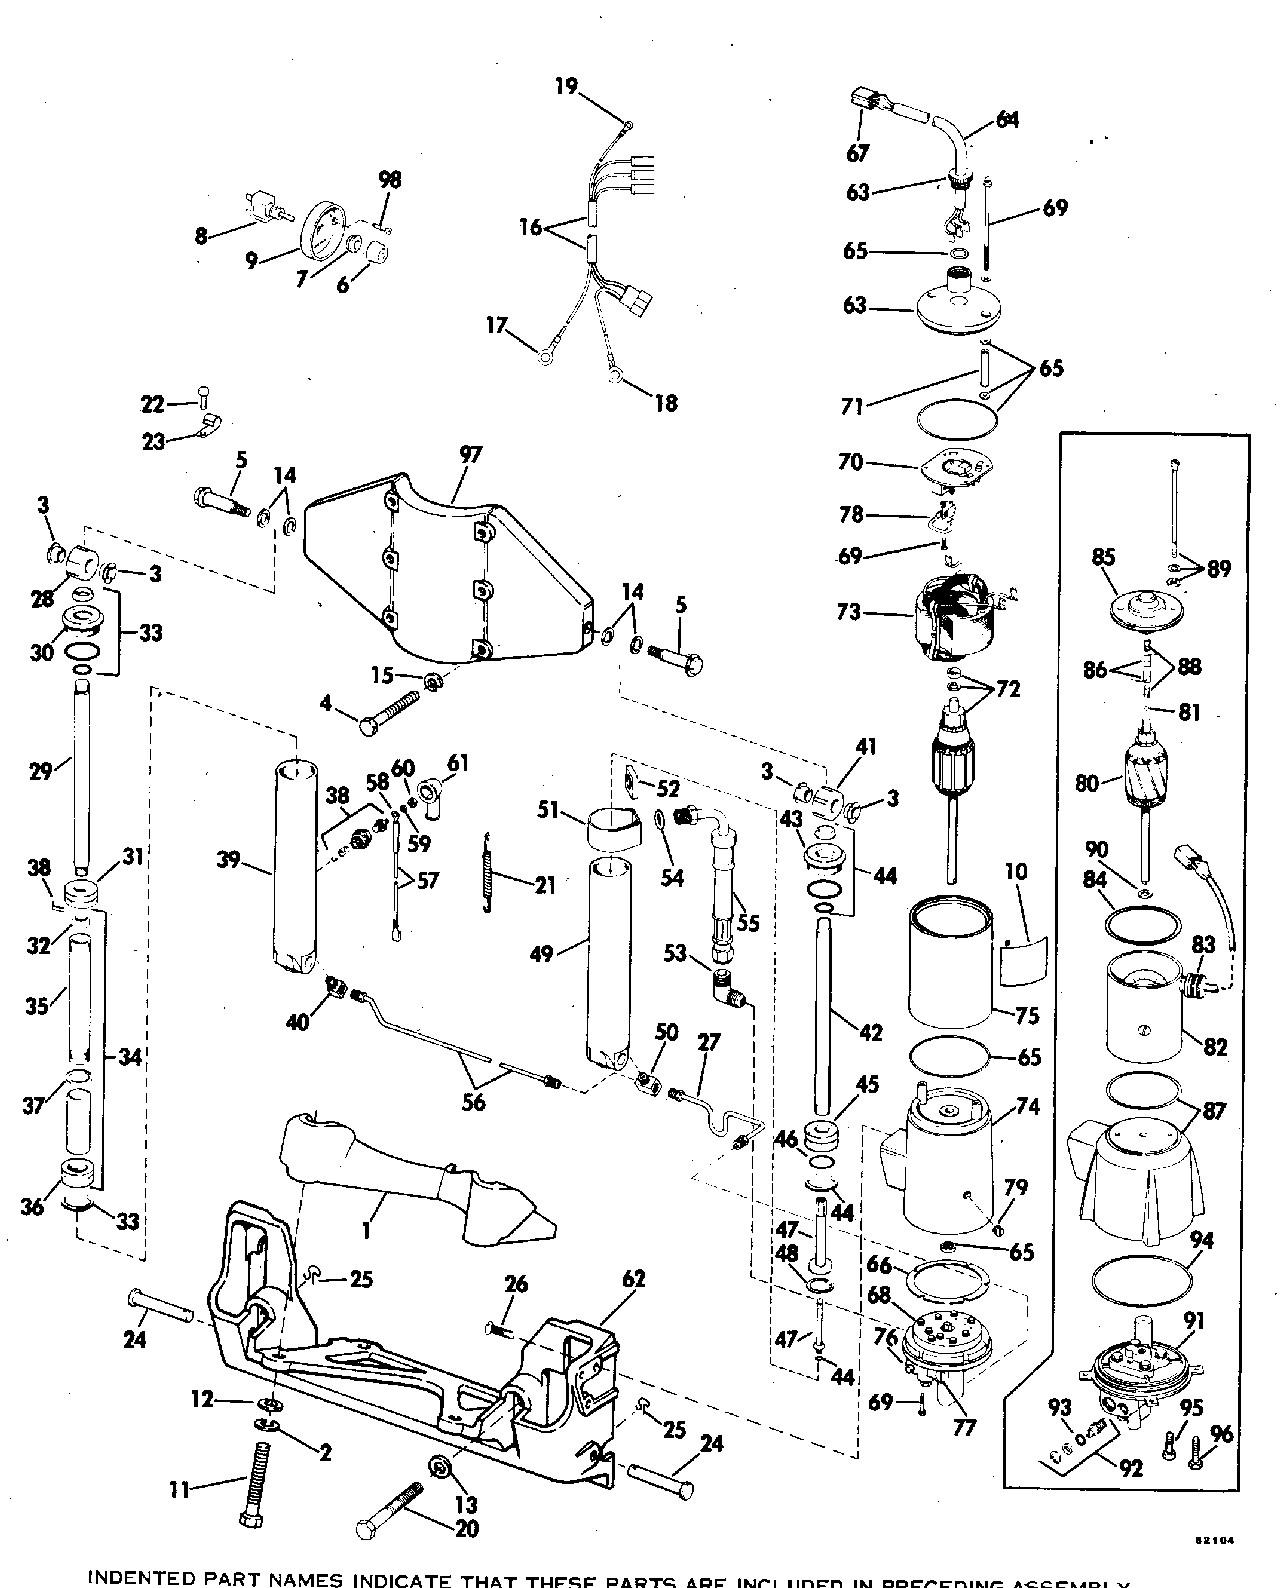 evinrude tilt and trim wiring diagram